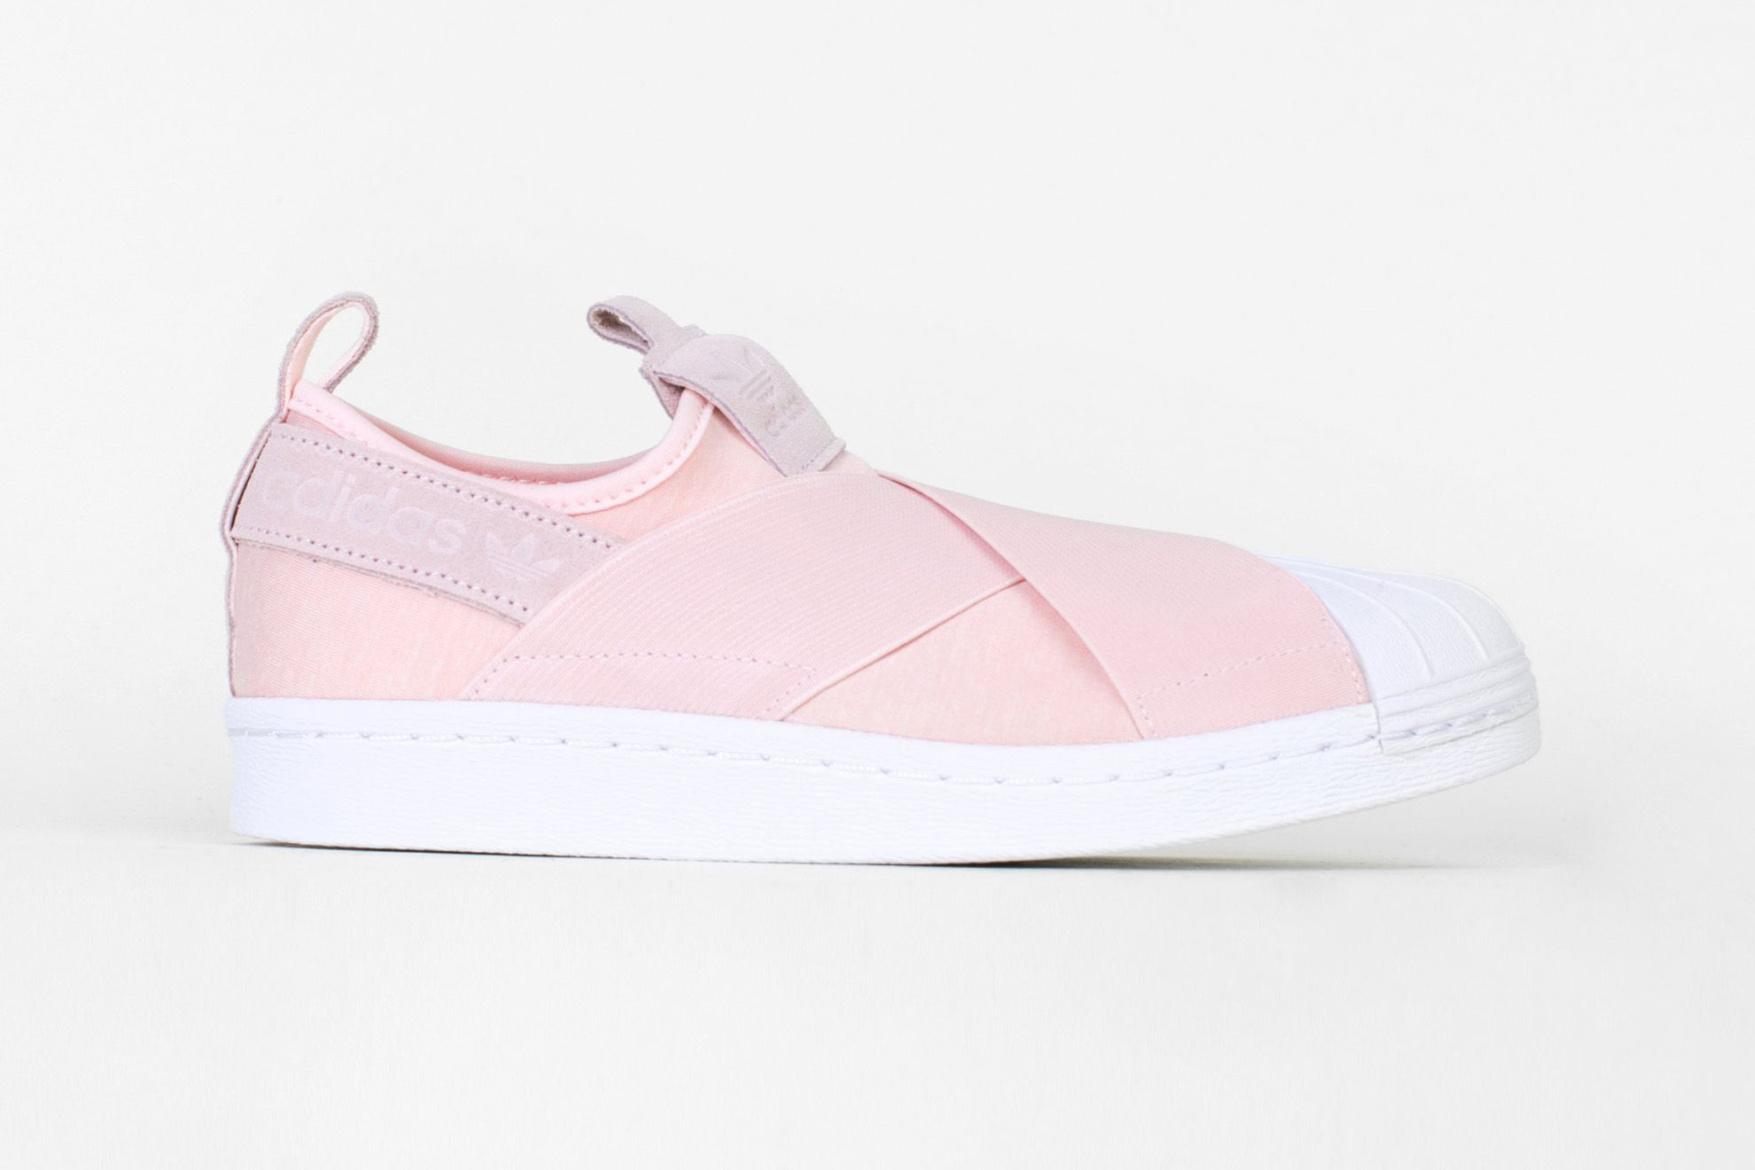 adidas-originals-superstar-slip-on-pink-02.jpg